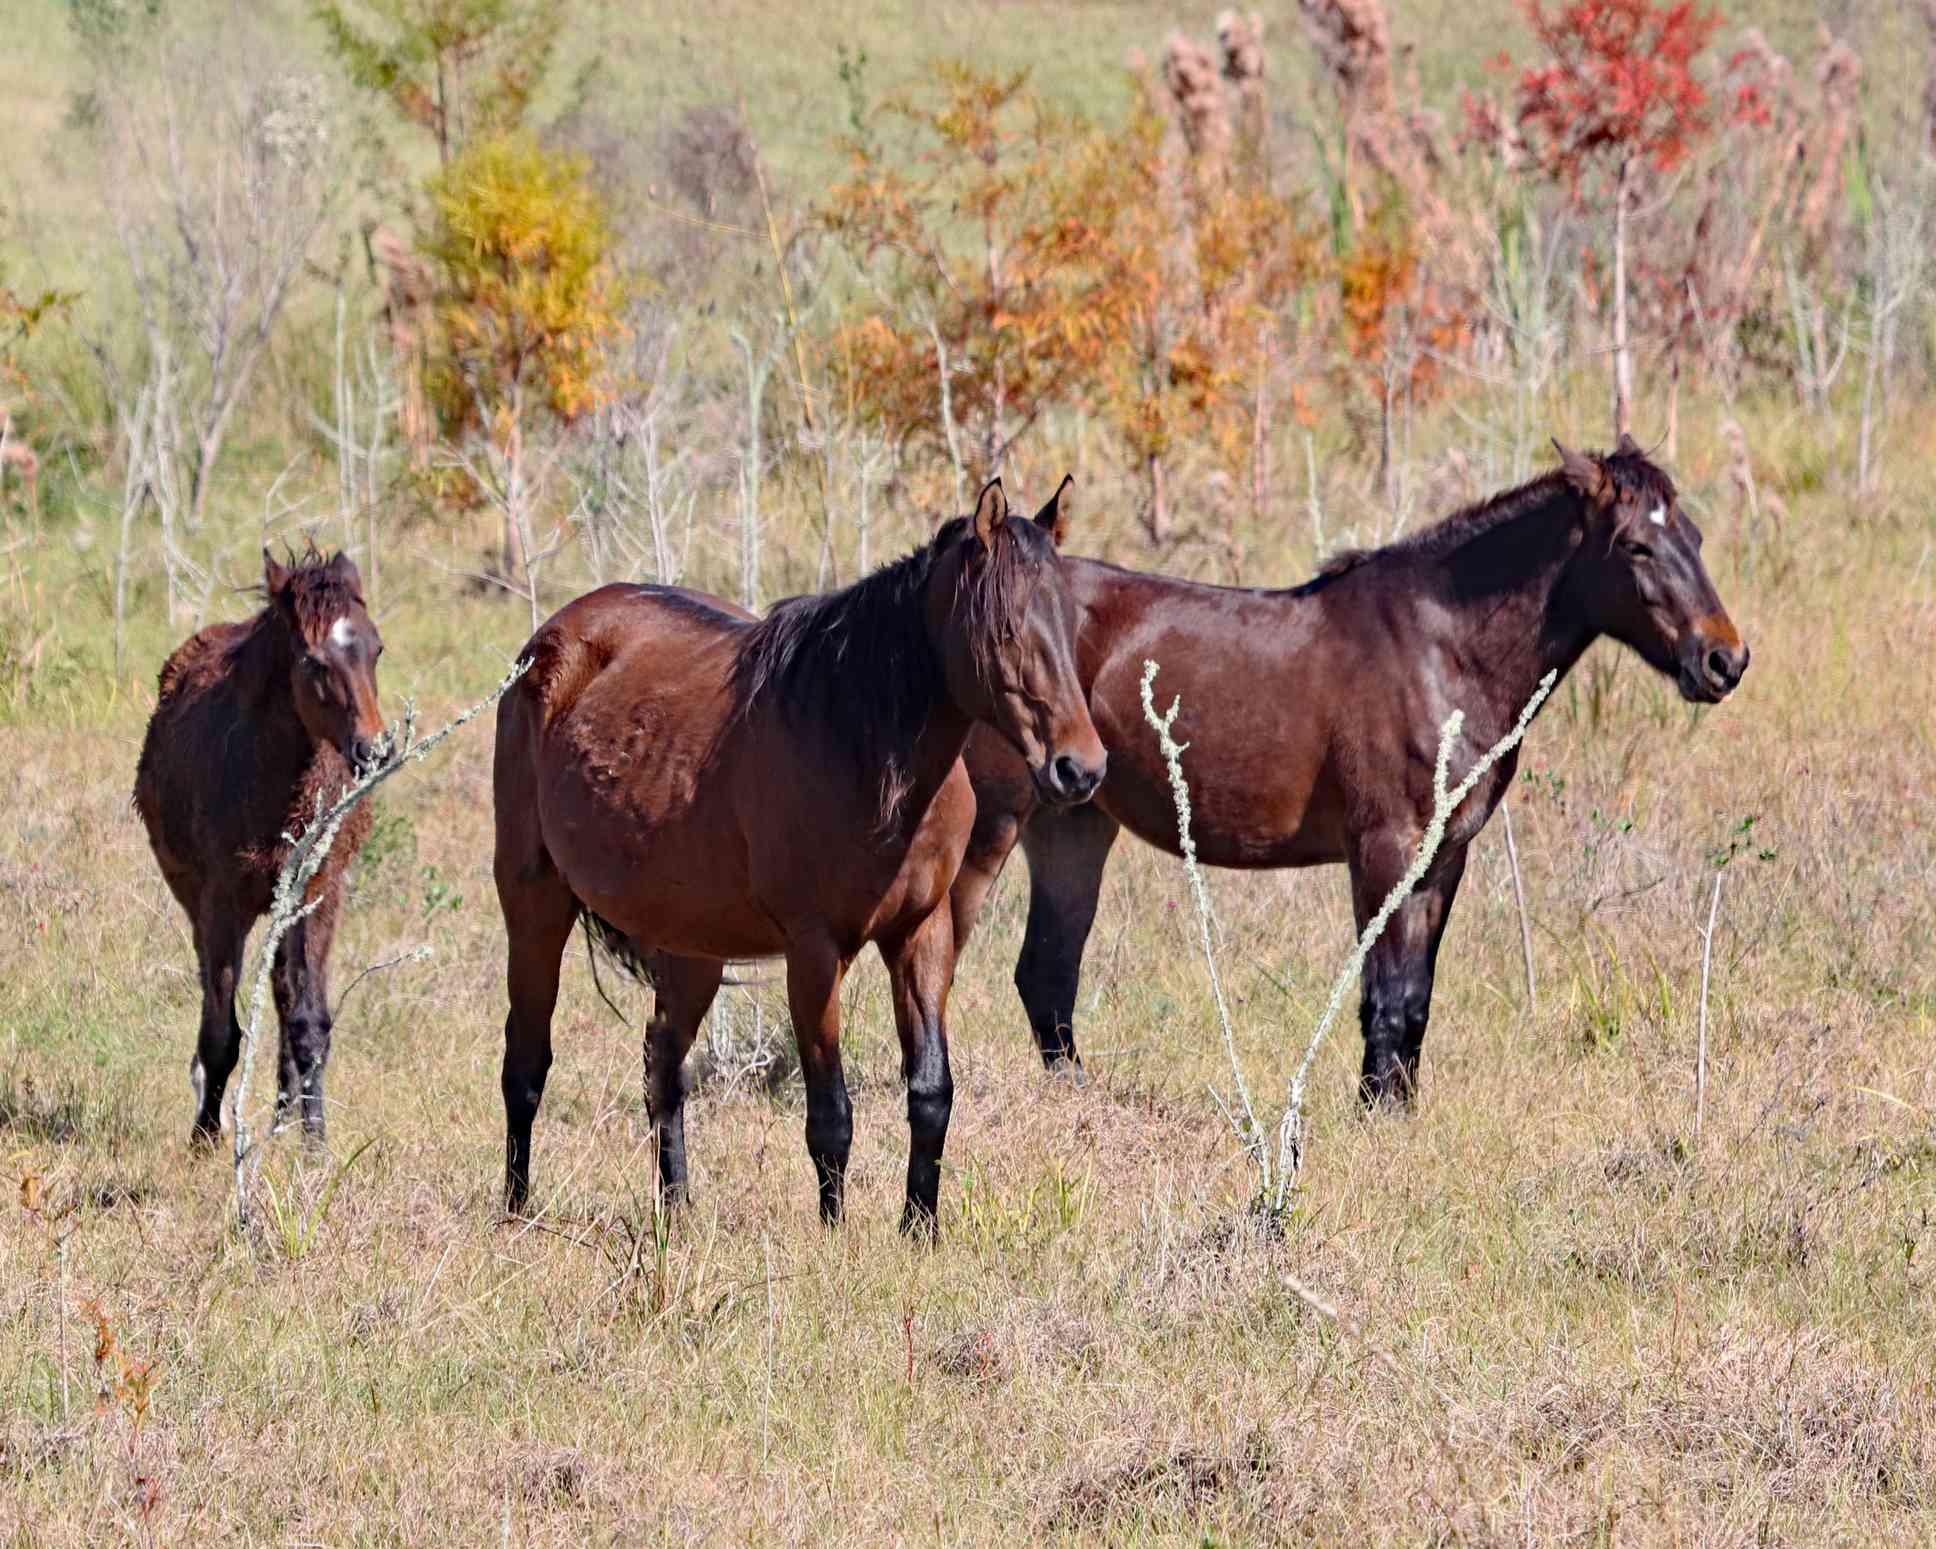 Herd of bay Florida Cracker Horses in a field.